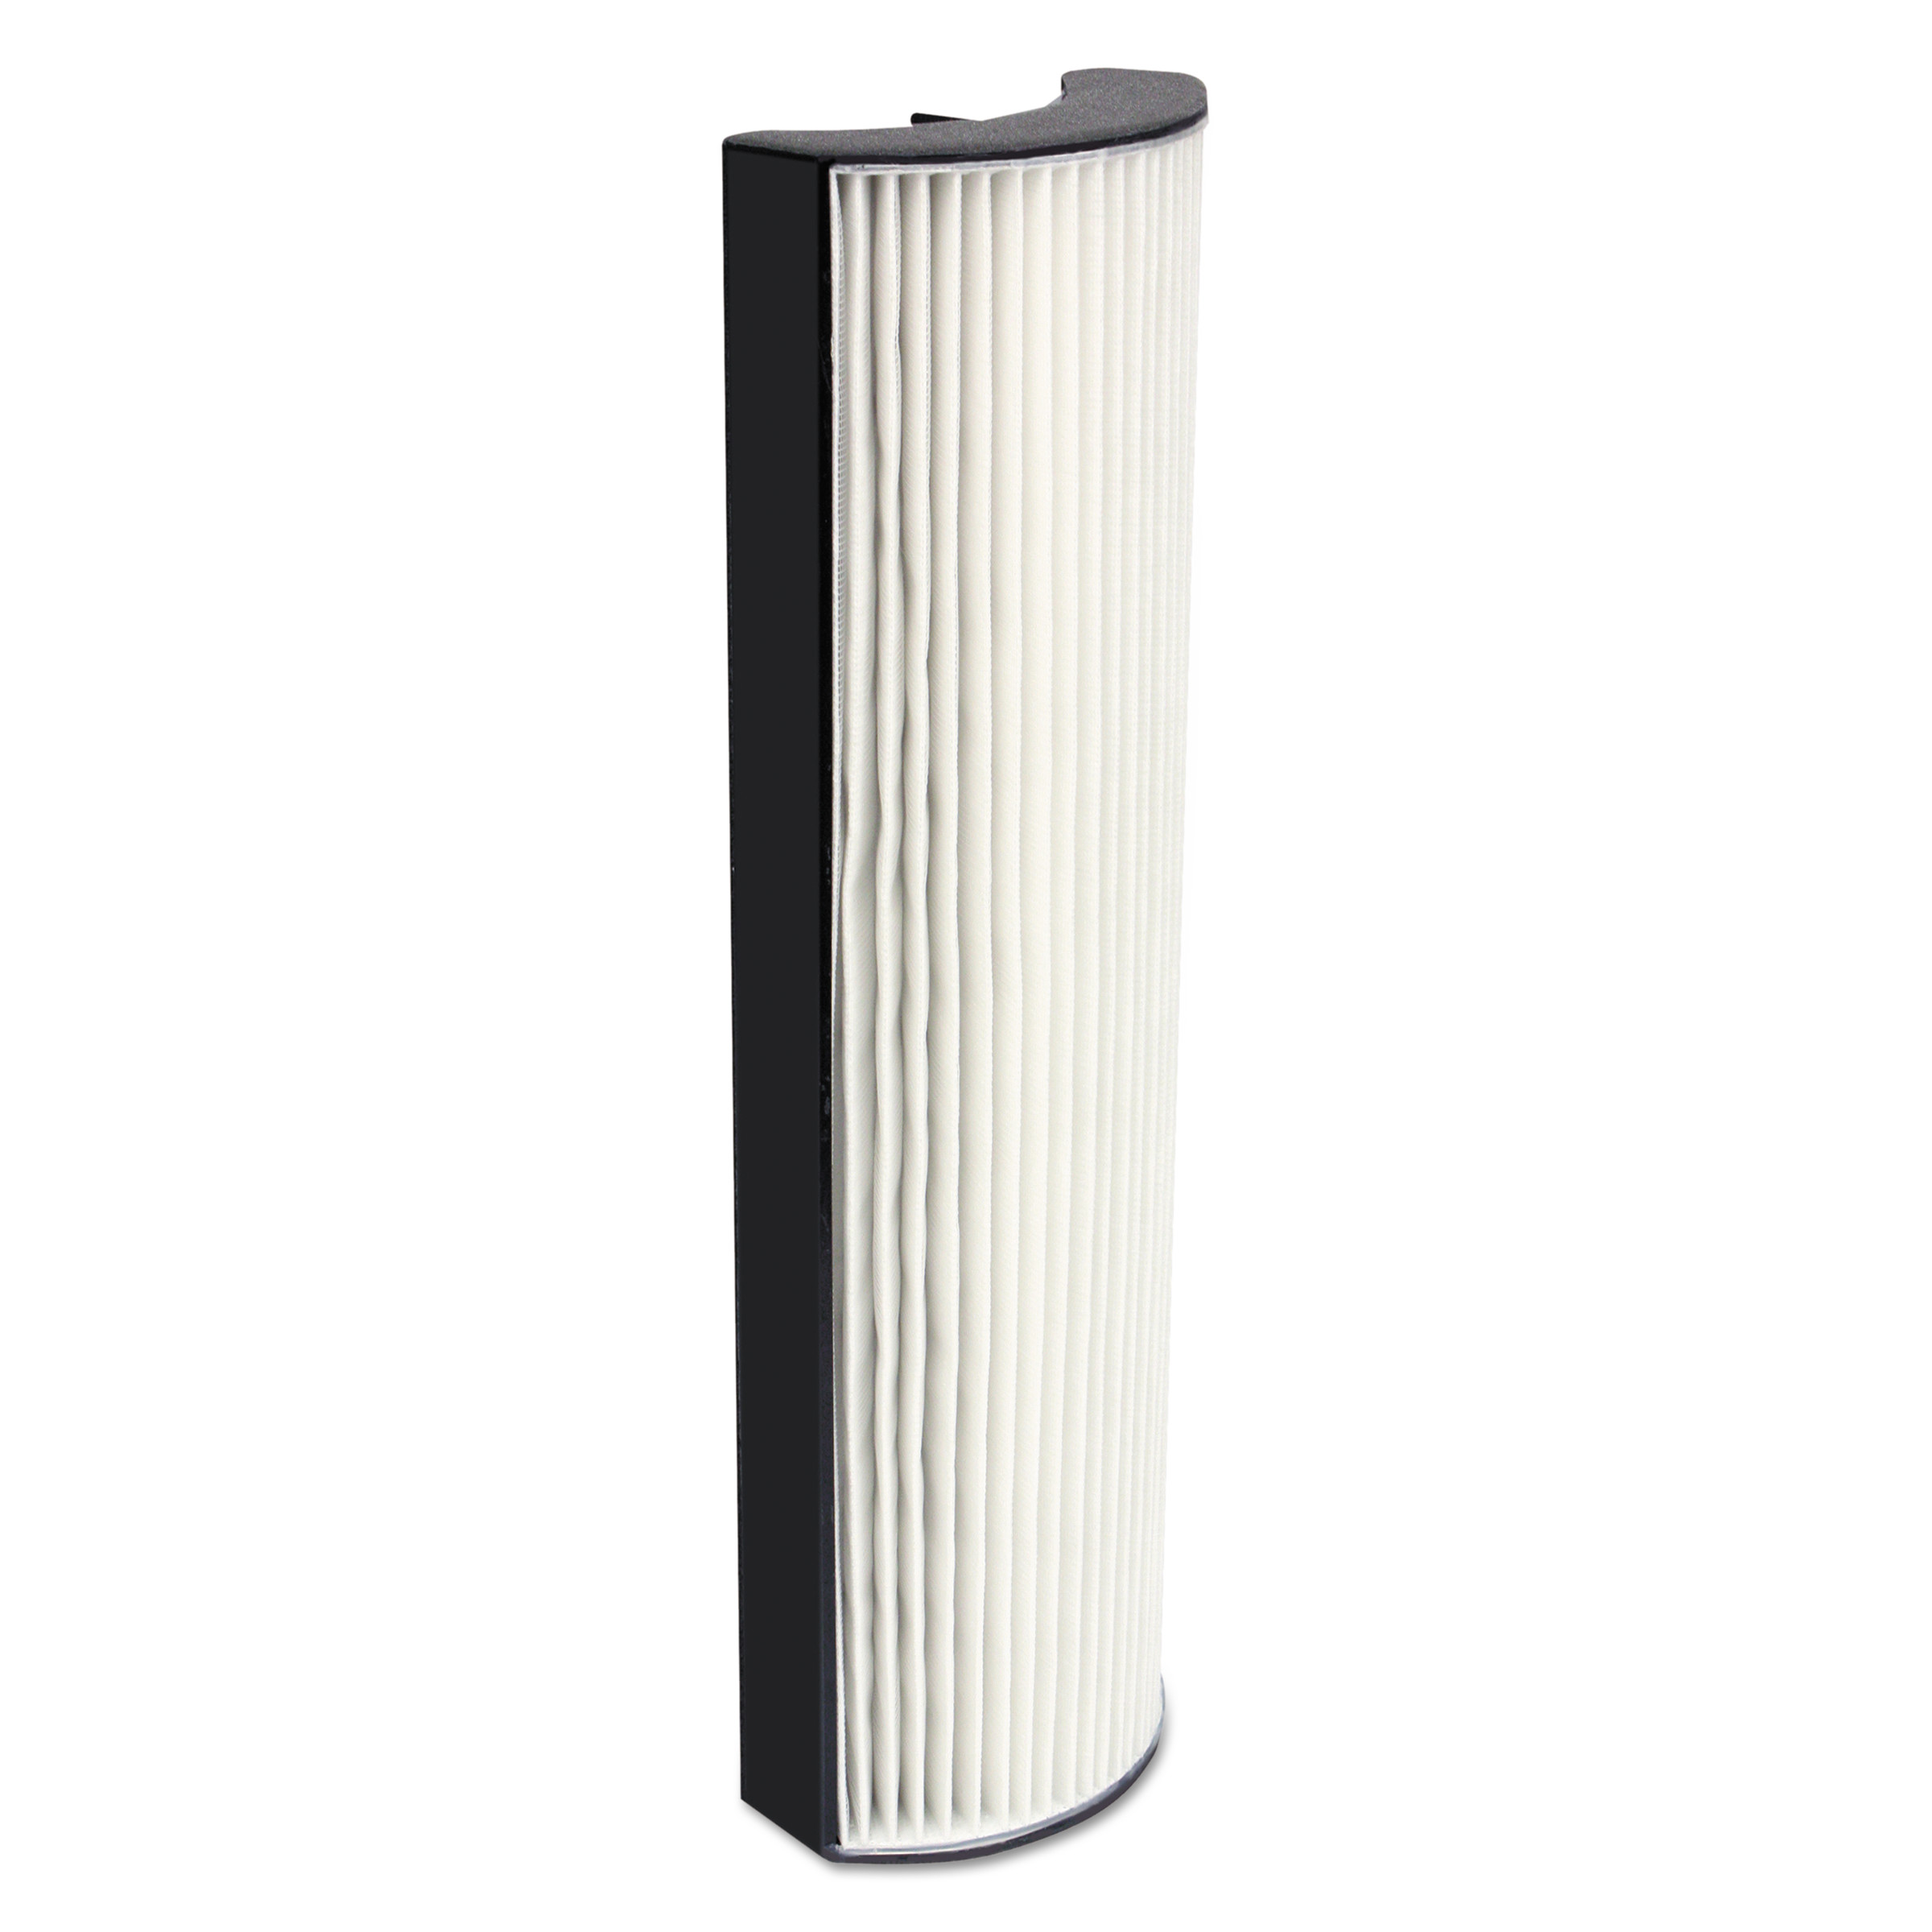 Allergy Pro Replacement Filter for Allergy Pro 200 Air Purifier. 5 x 3 x 17 - Walmart.com - Walmart.com